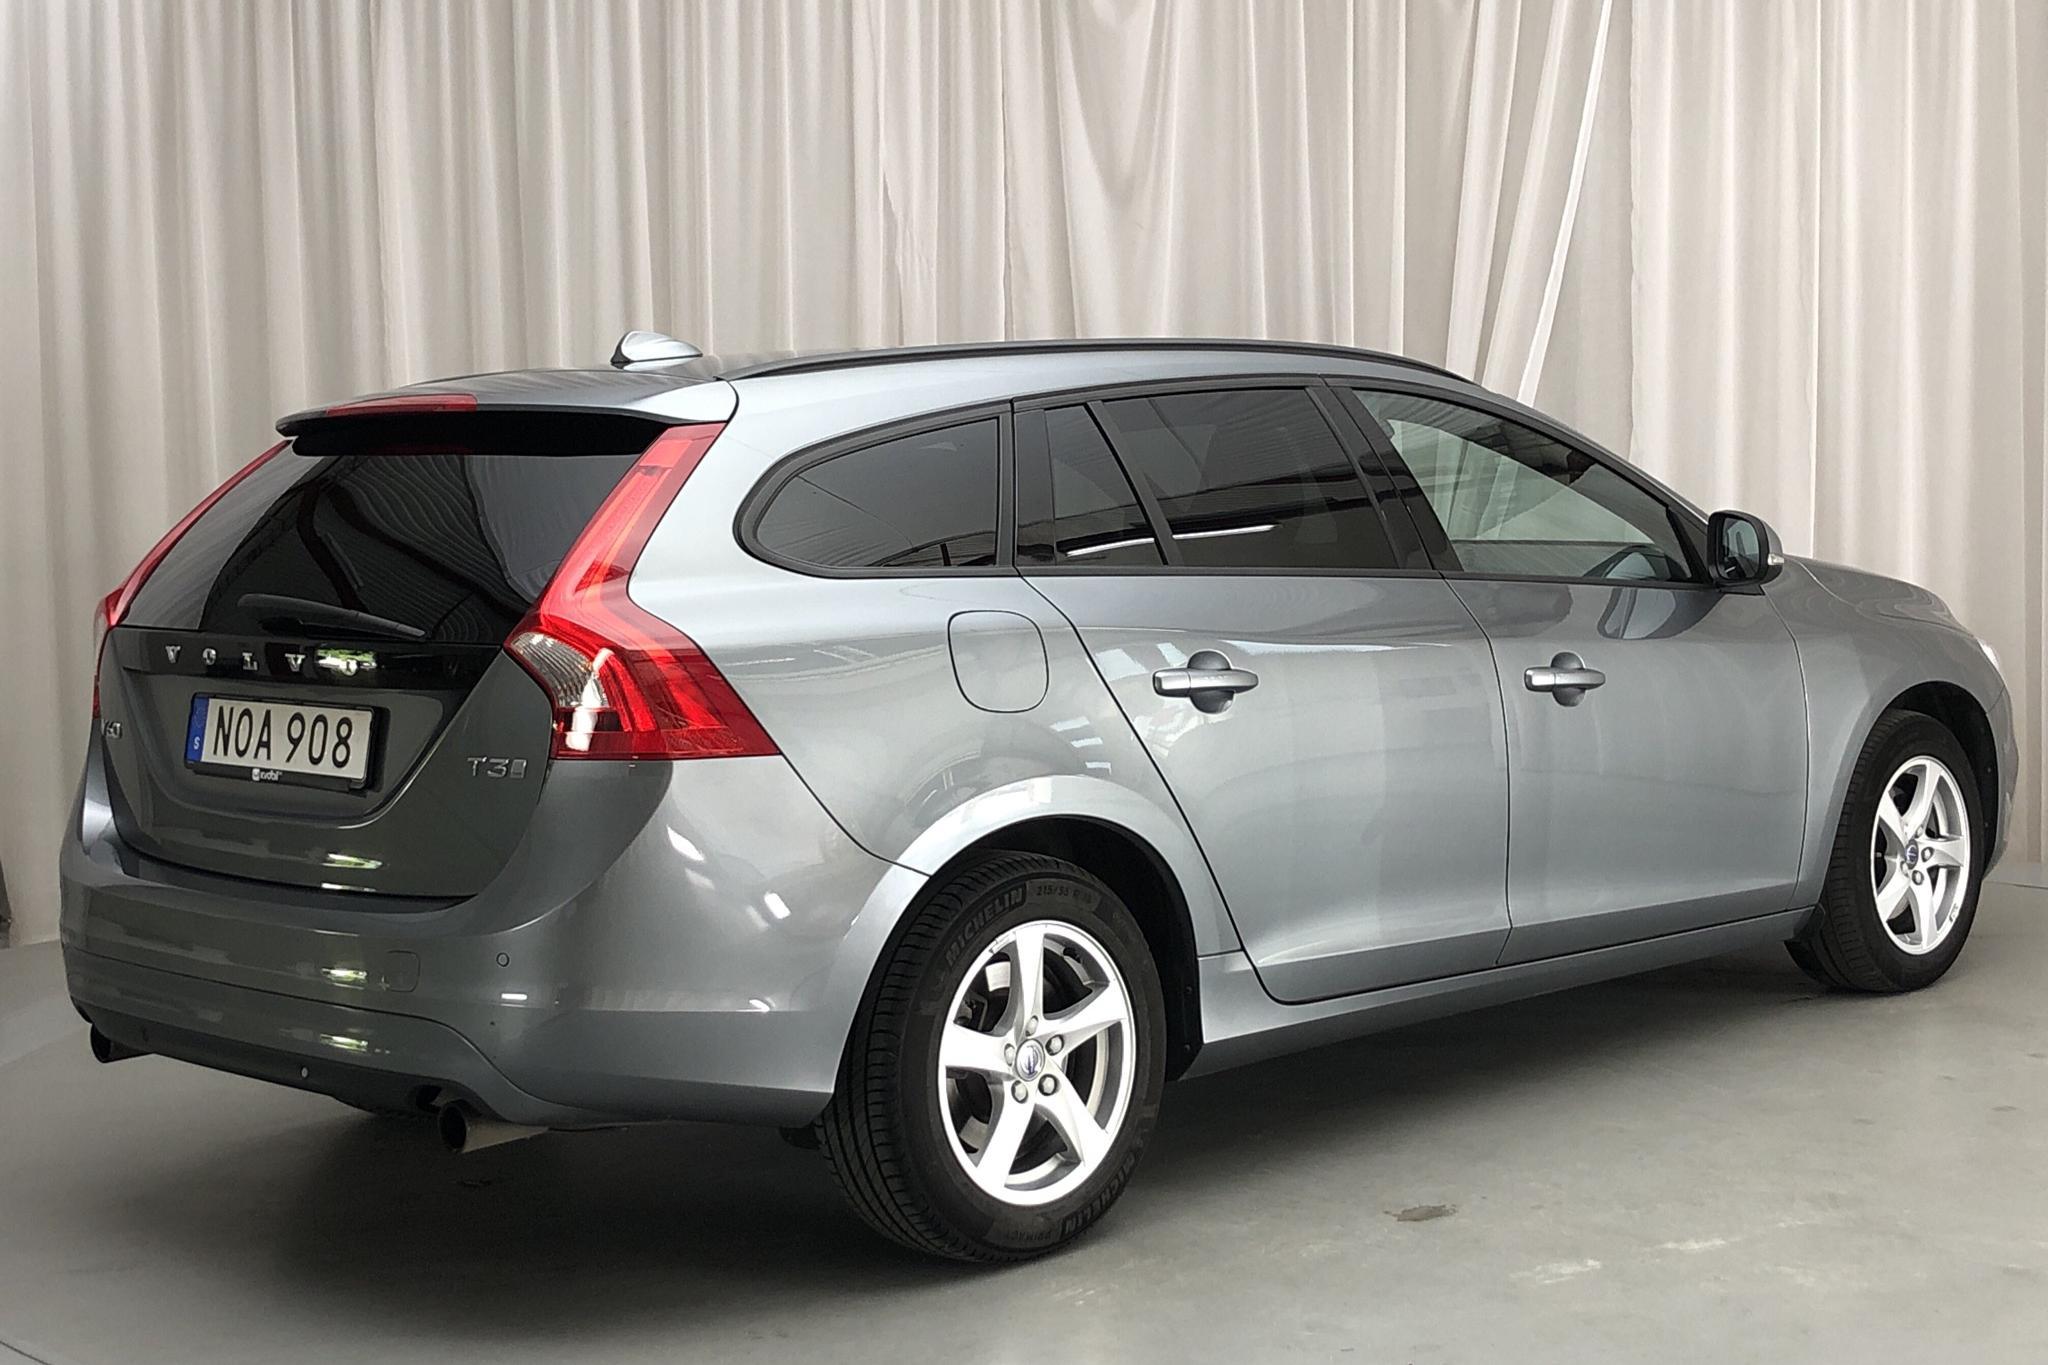 Volvo Volvo V60 T3 (152hk) - 59 350 km - Automatic - gray - 2018